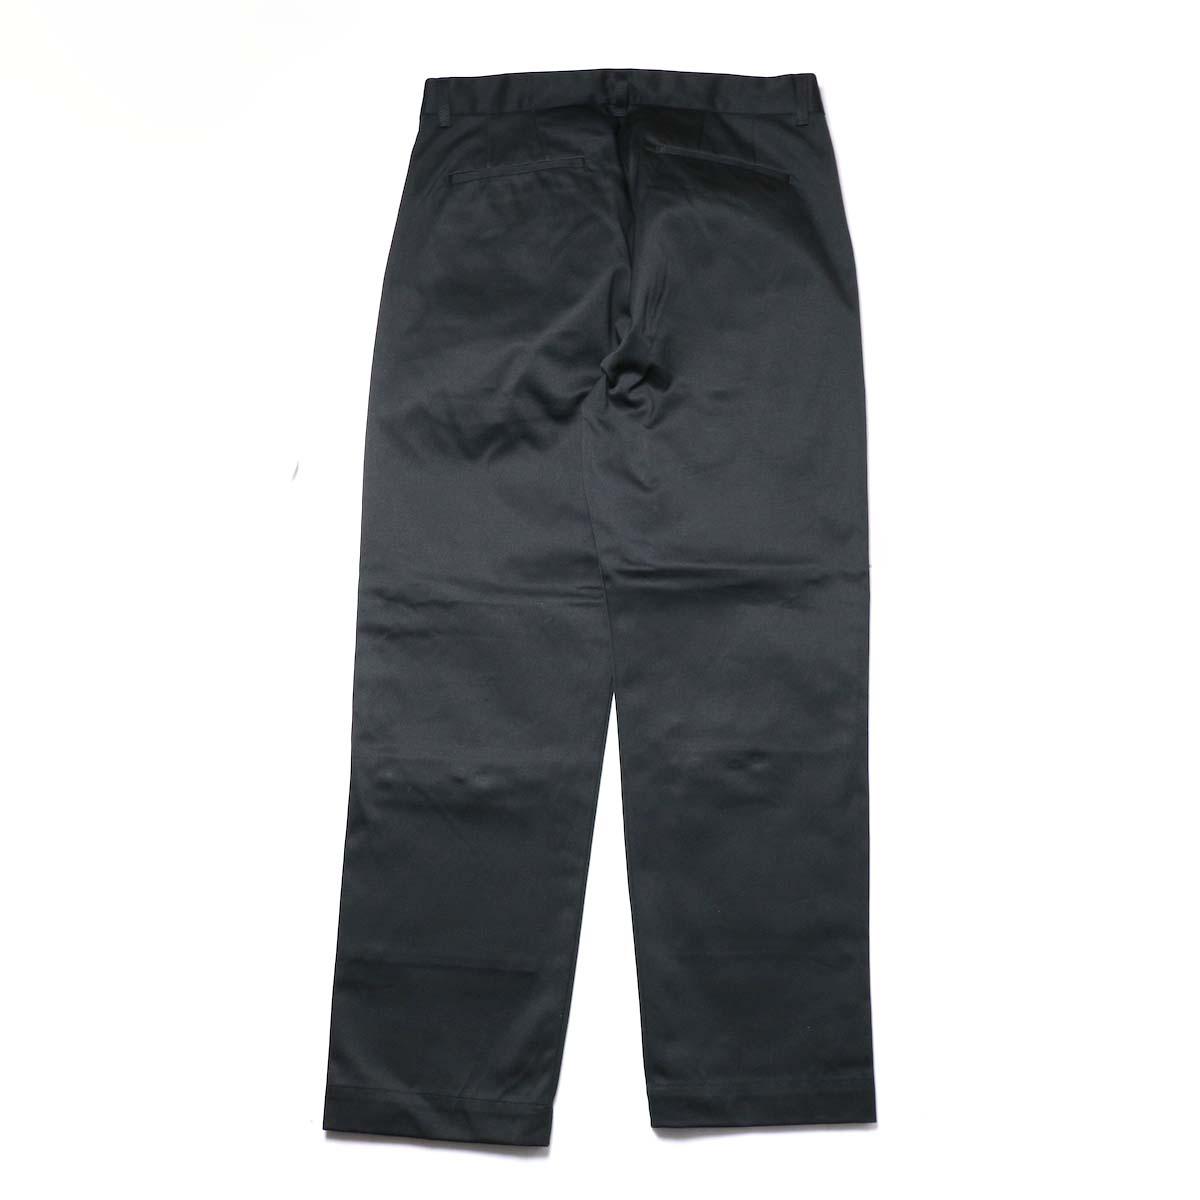 FUTURE PRIMITIVE / FP FZ FLIGHT CHINO PANTS (Black)背面